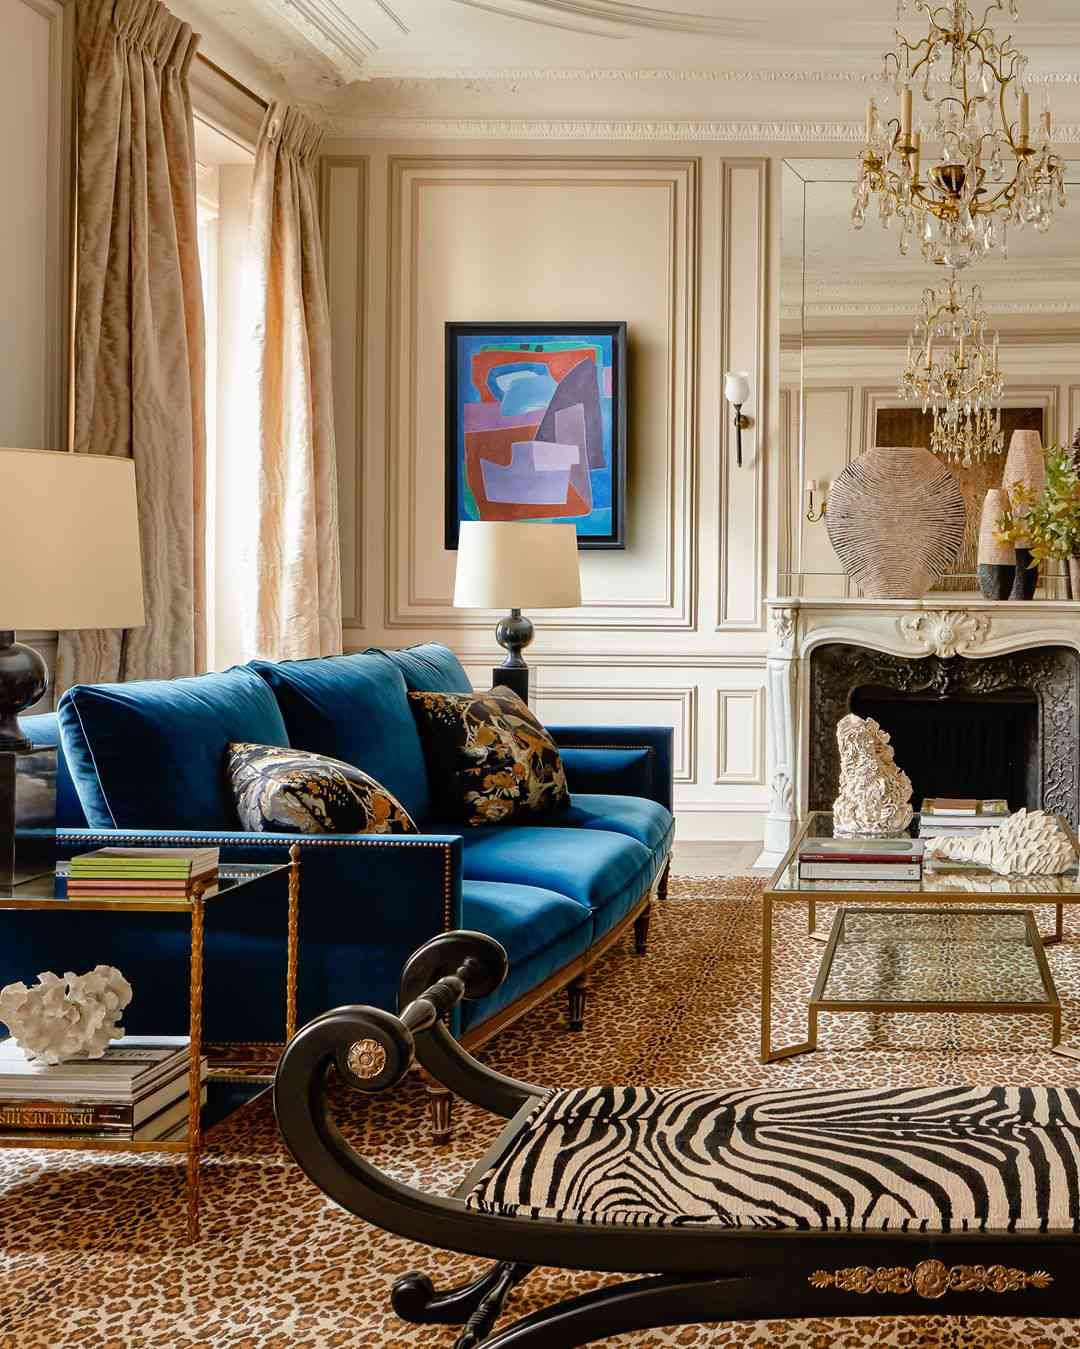 Living room with zebra print and blue sofa